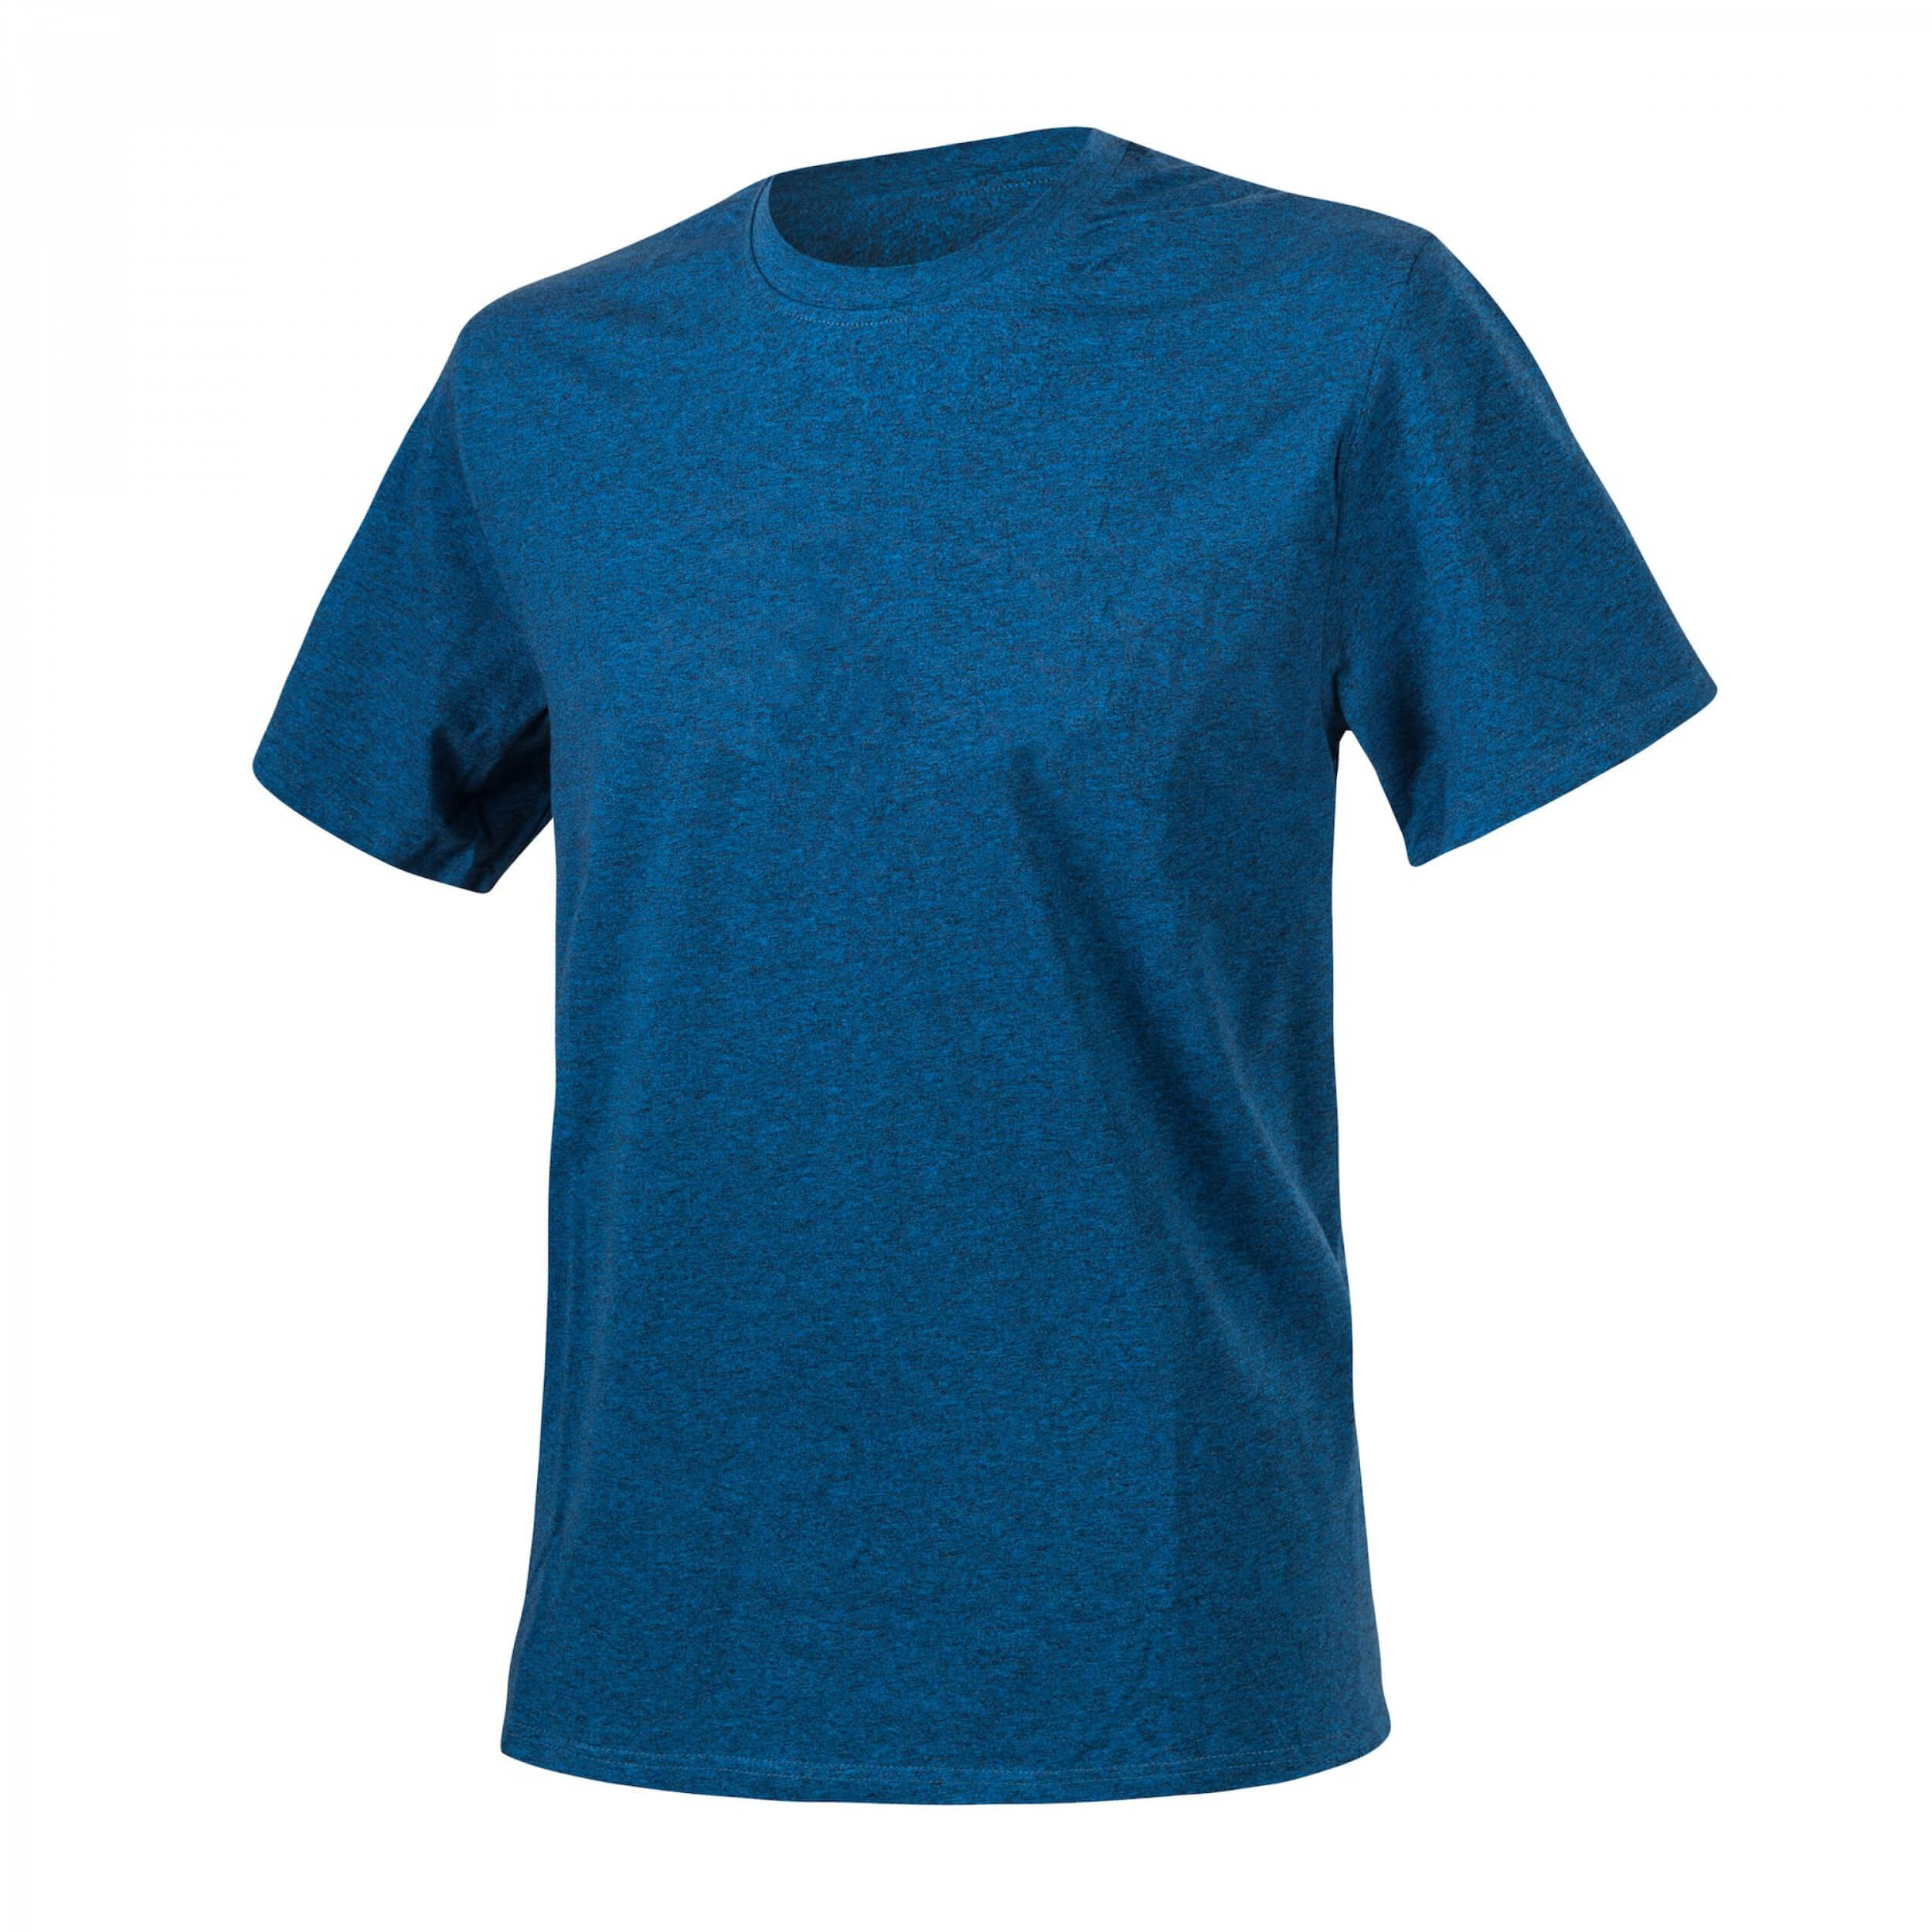 Helikon-Tex Classic T-Shirt - Melange Blue